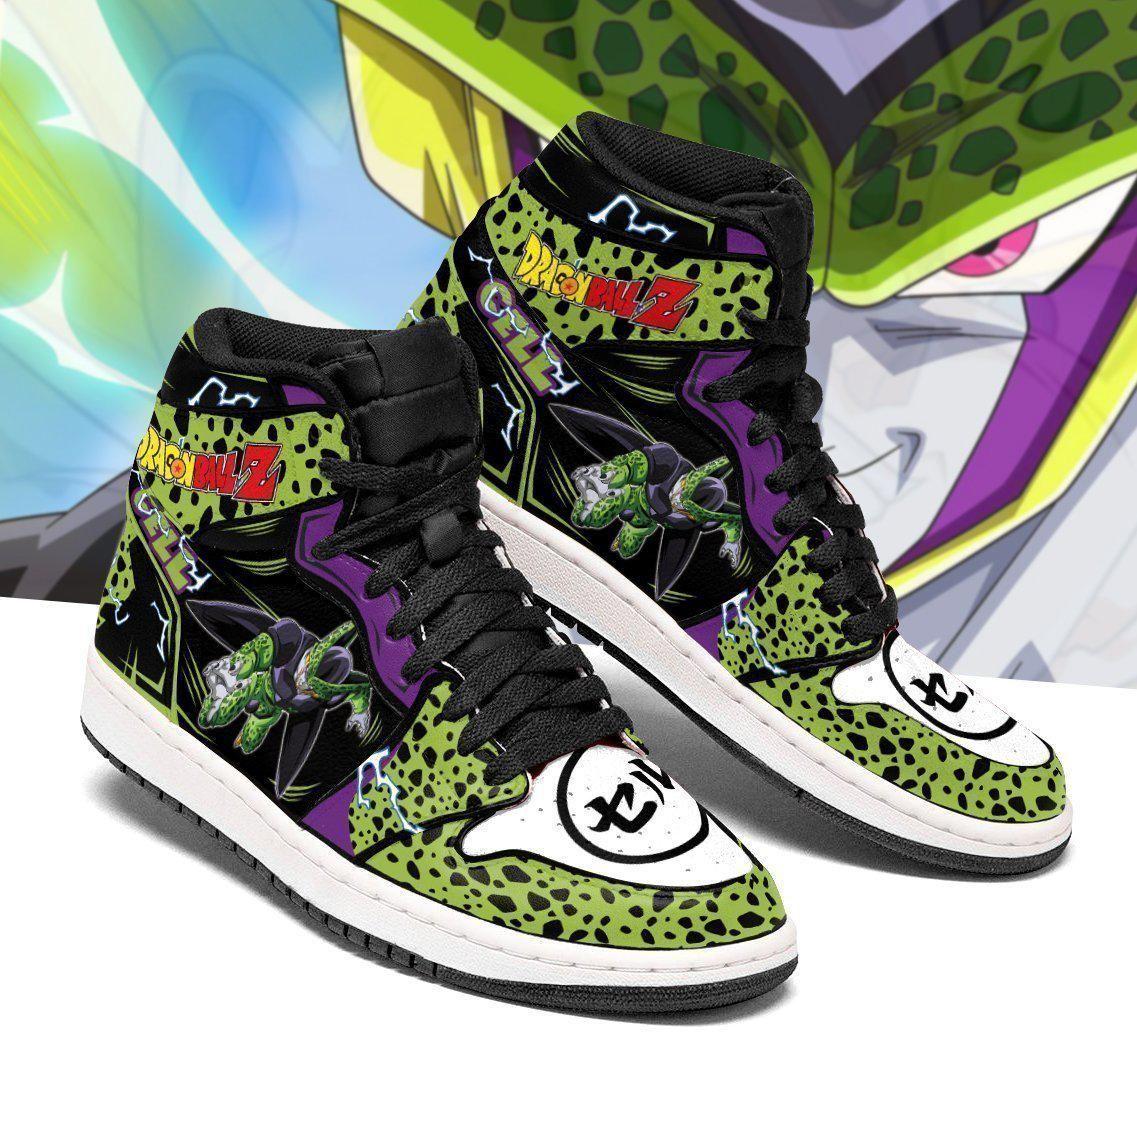 Dragon Ball Cell Sneakers Custom Anime DBZ Shoes Fan Gift Idea GO1210